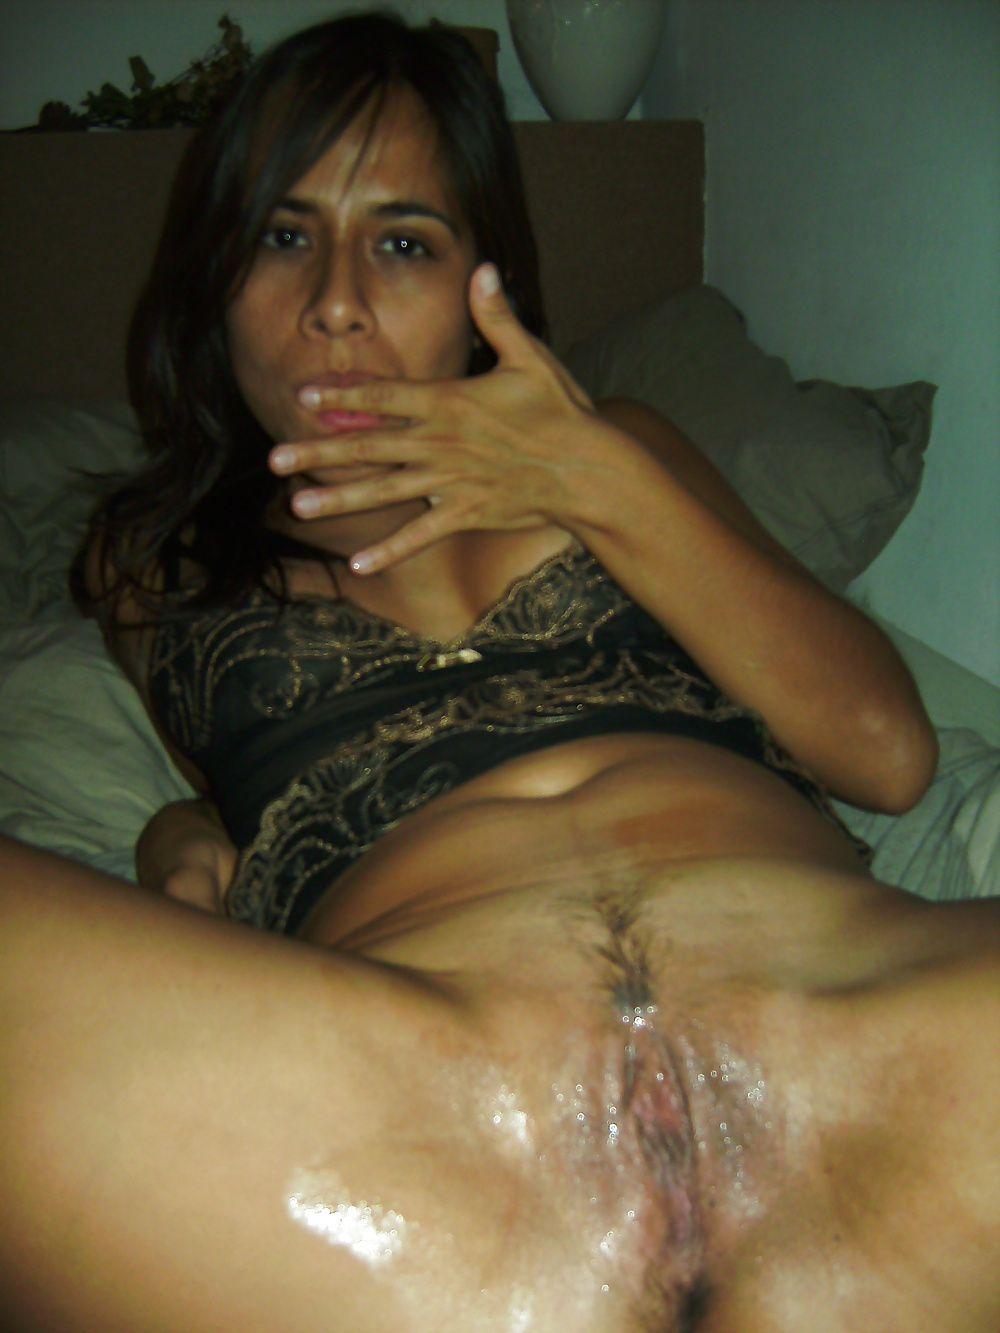 best of Roger nude pics Kelis